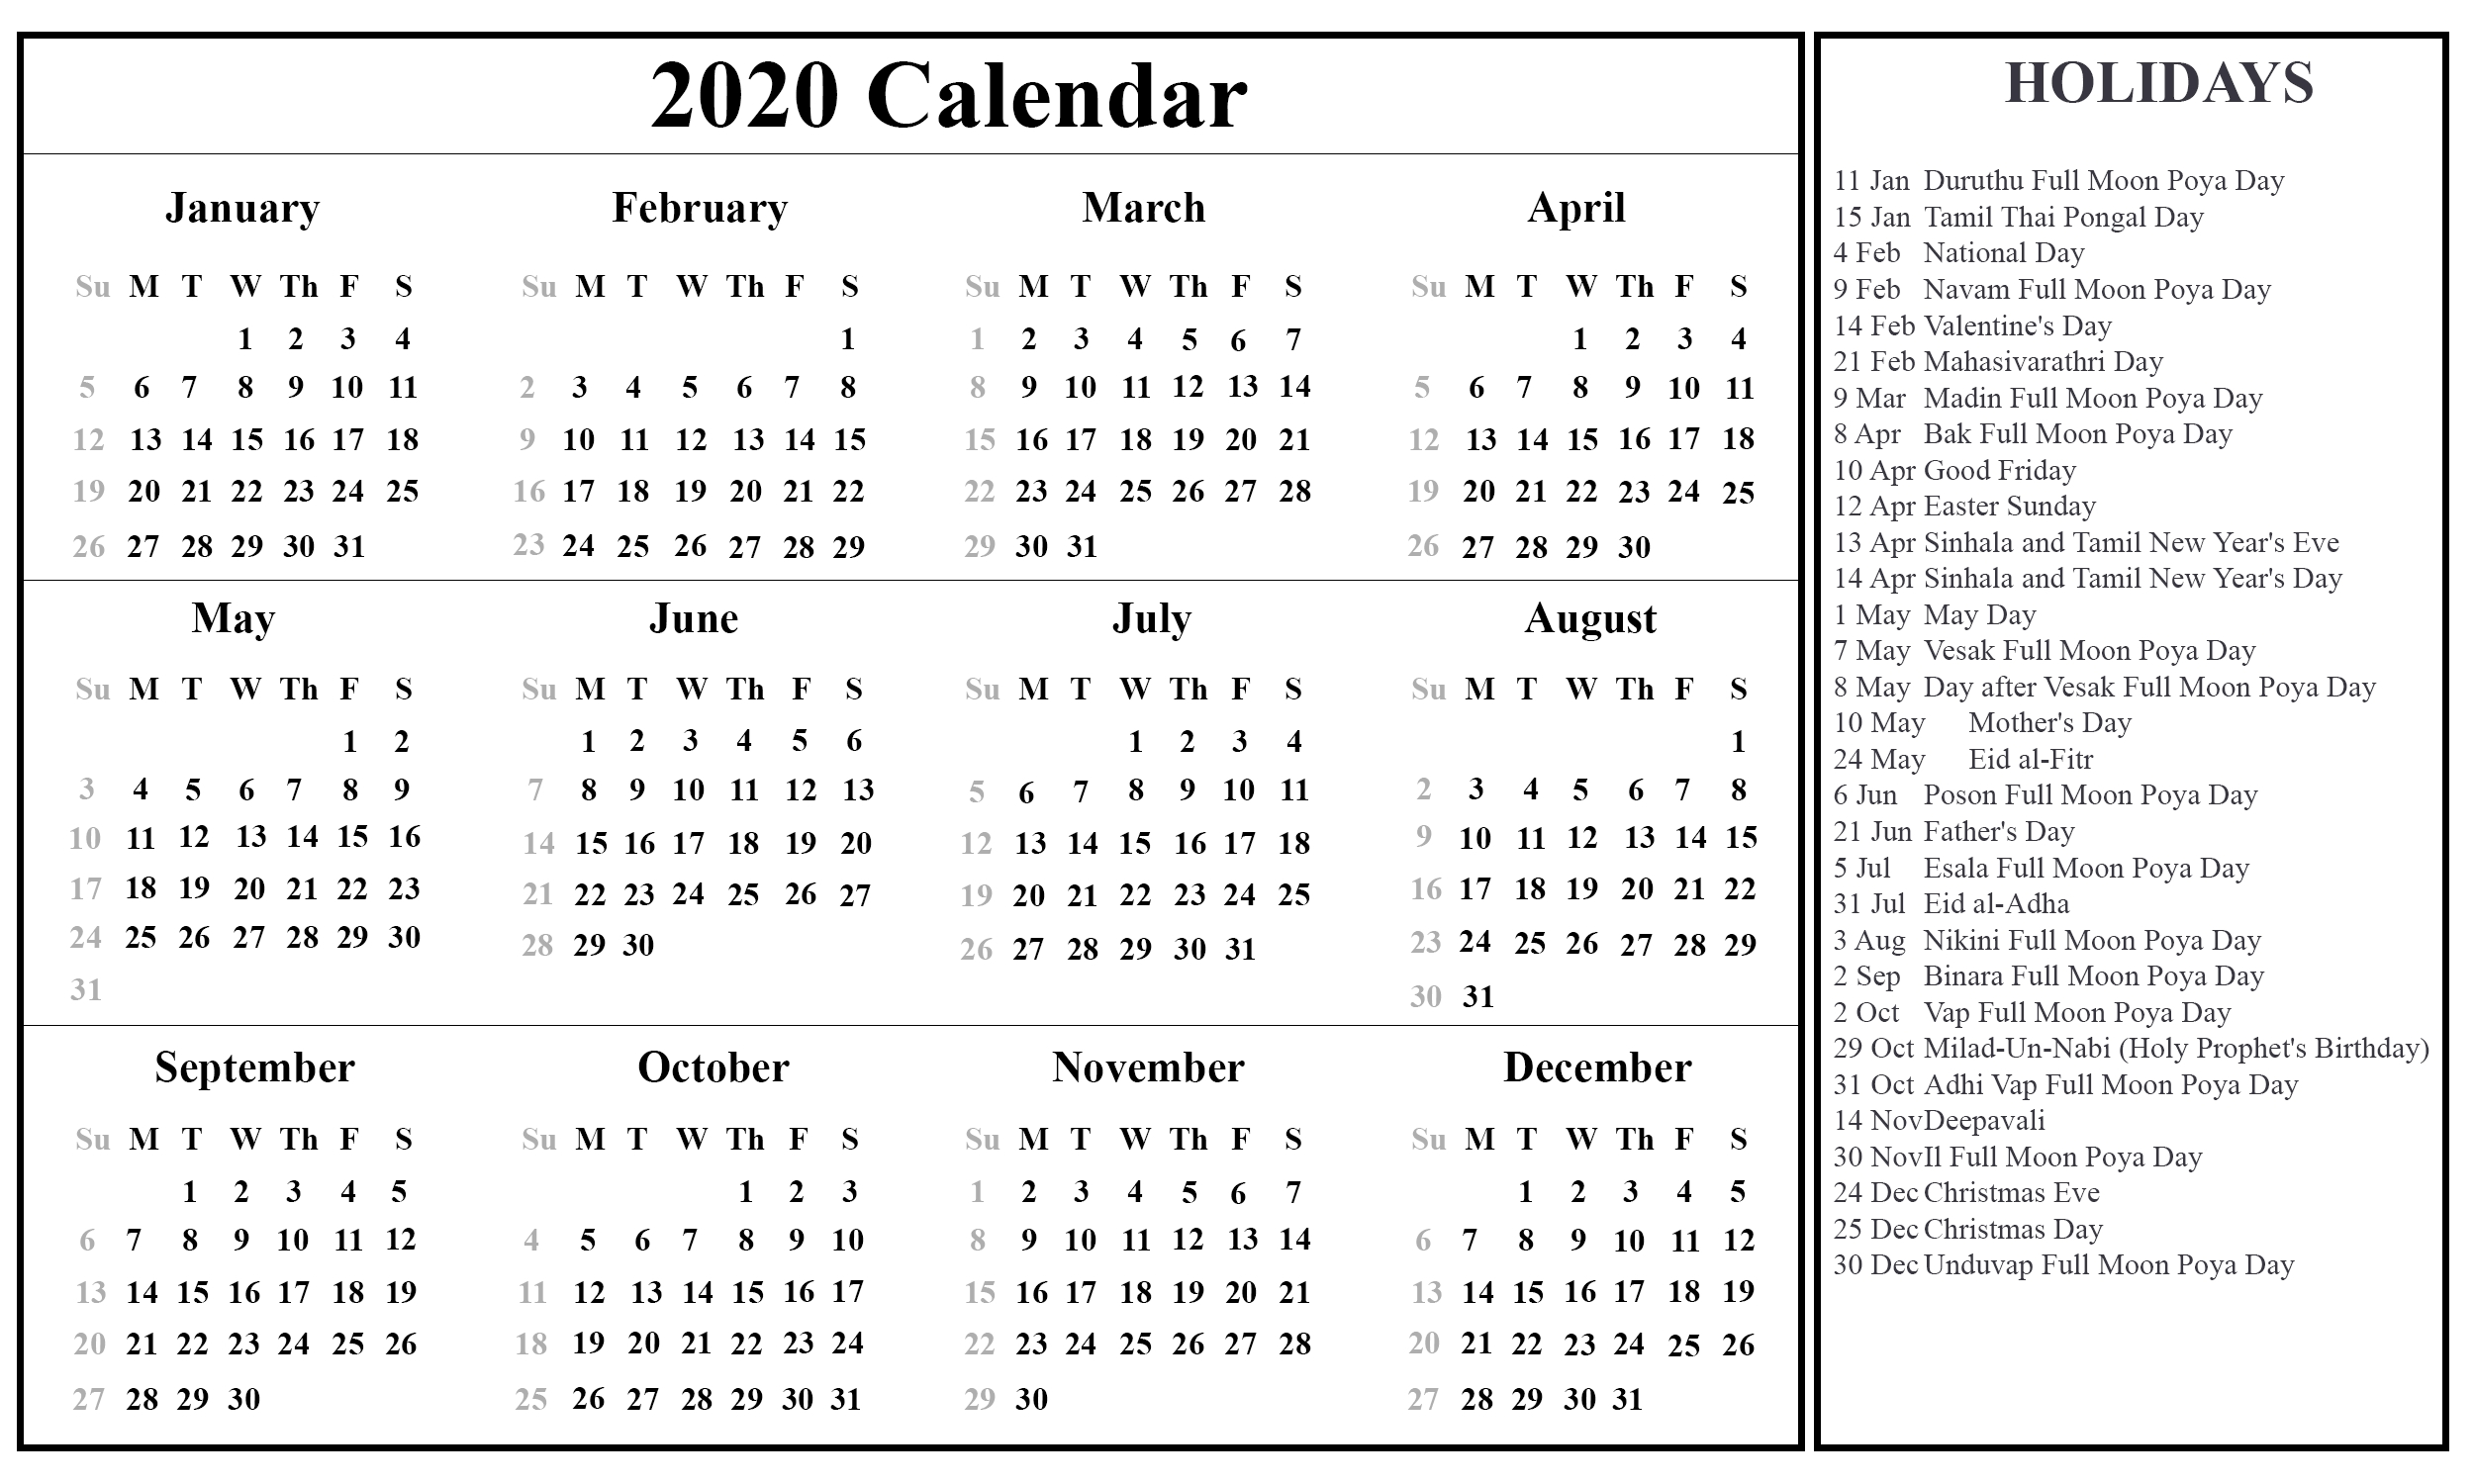 Printable August Calendar Template-Calendar For 2020 Printable With Legal Holidays